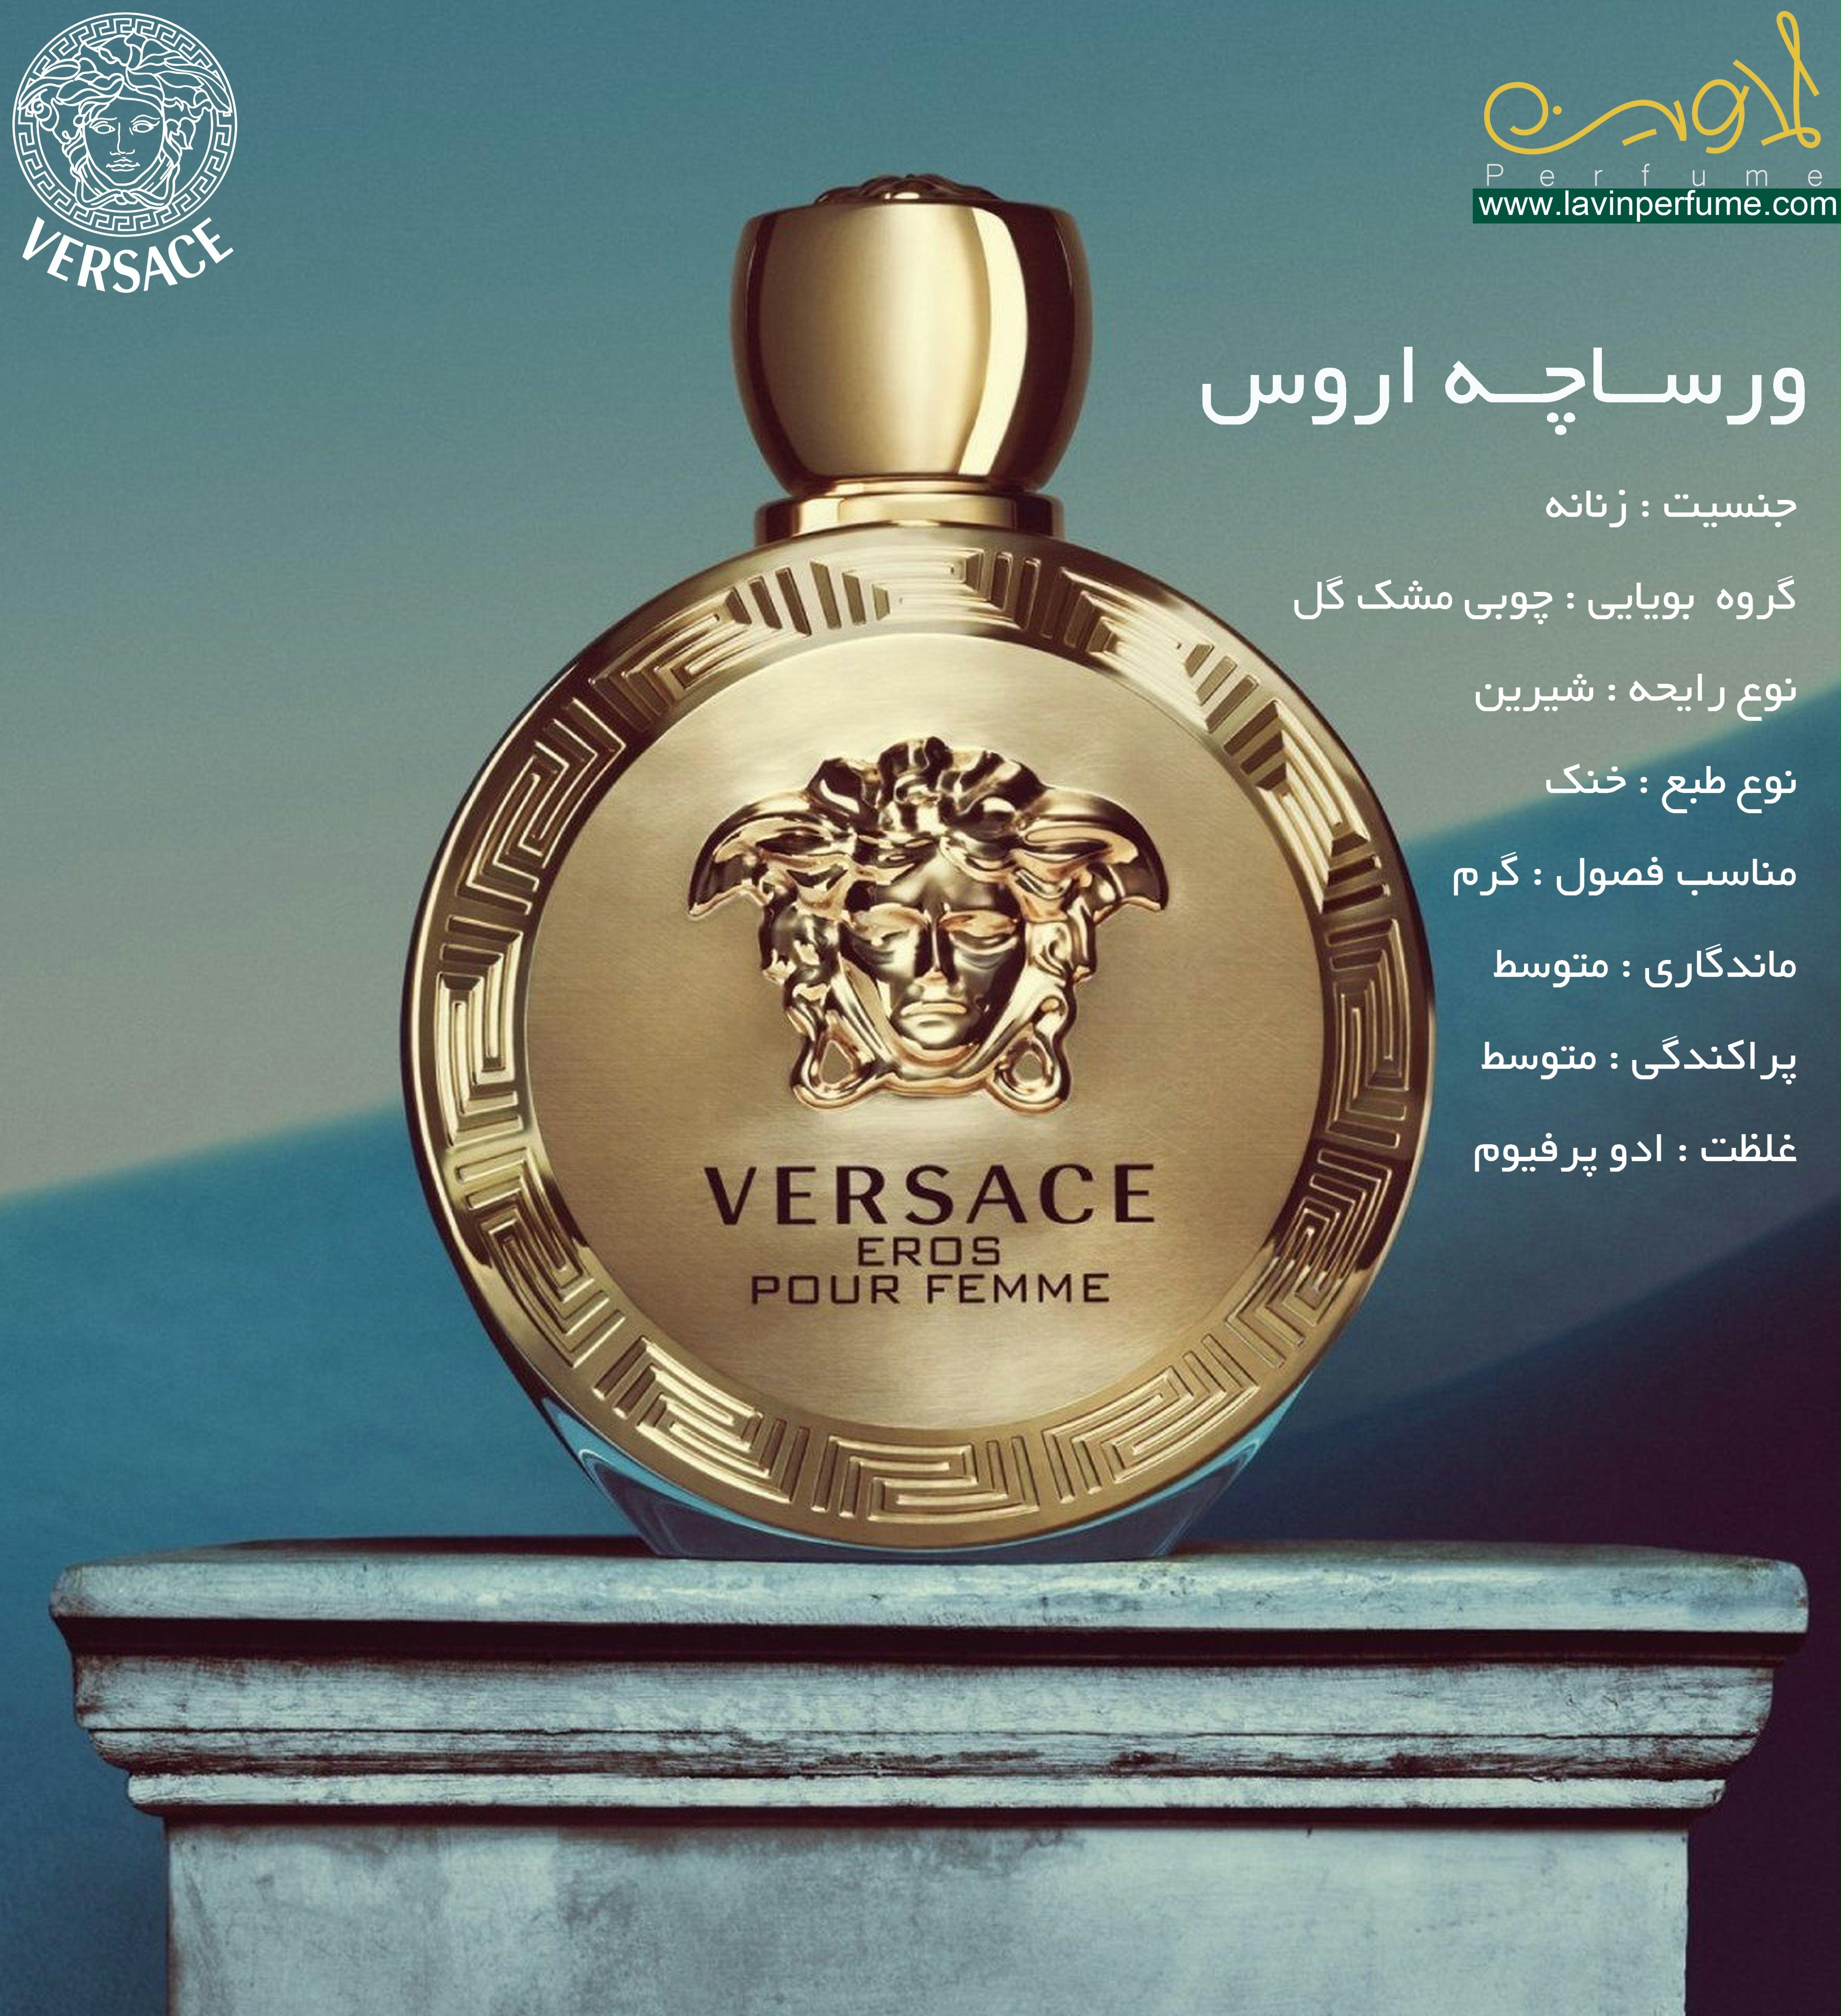 4a411e989 ادکلن ورساچه اروس زنانه - Versace Eros Pour Femme | perfume ...